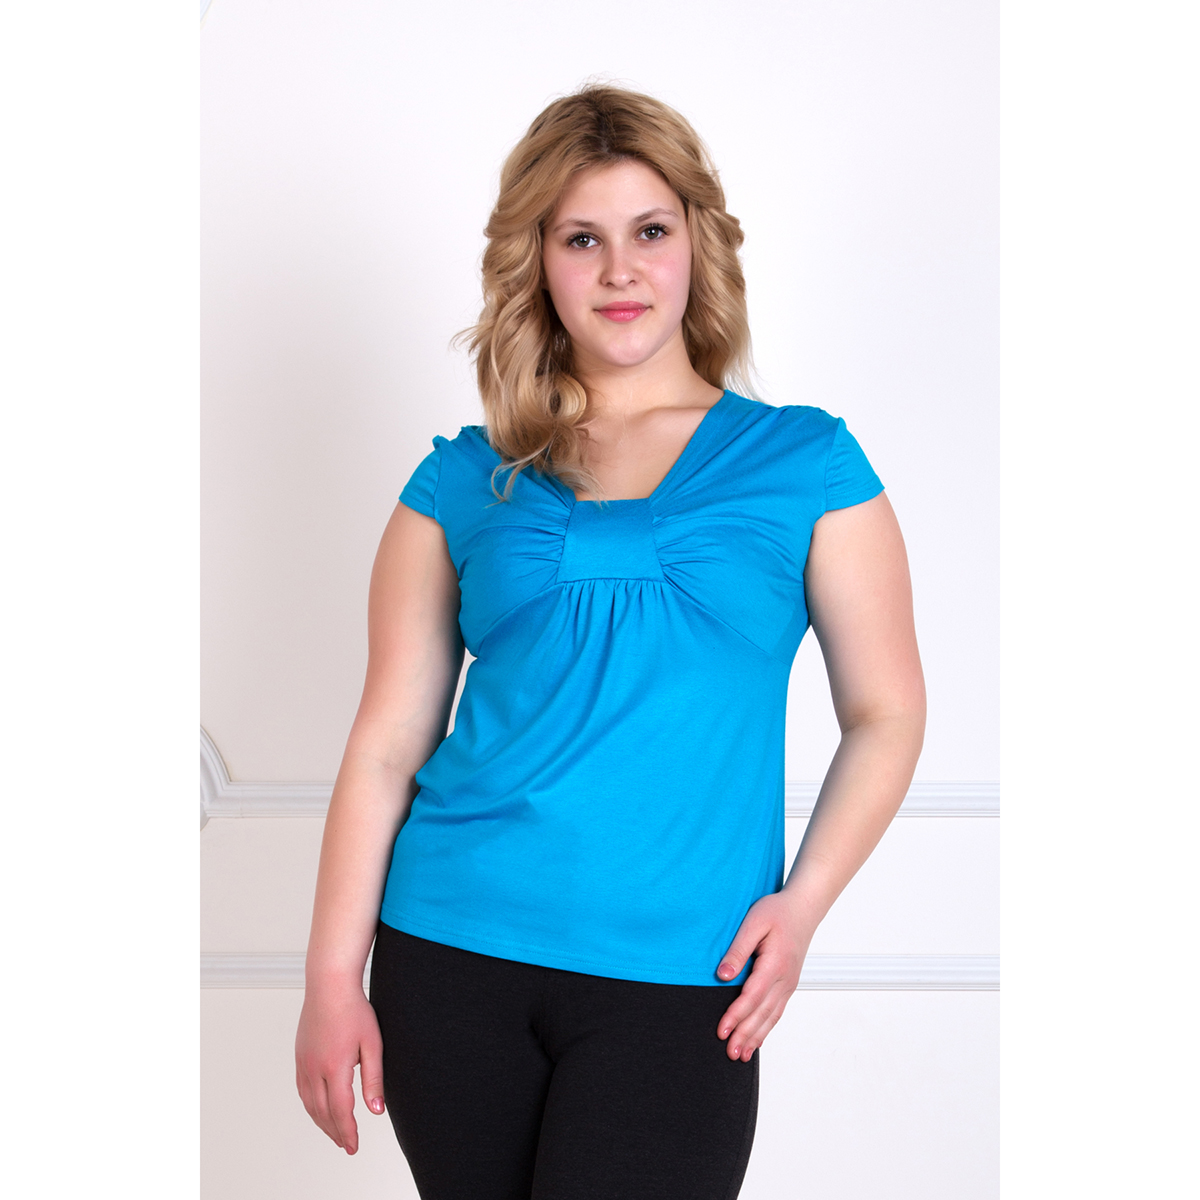 Женская блуза Романтика Голубой, размер 44Блузы<br>Обхват груди: 88 см <br>Обхват талии: 68 см <br>Обхват бедер: 96 см <br>Рост: 167 см<br><br>Тип: Жен. блуза<br>Размер: 44<br>Материал: Вискоза